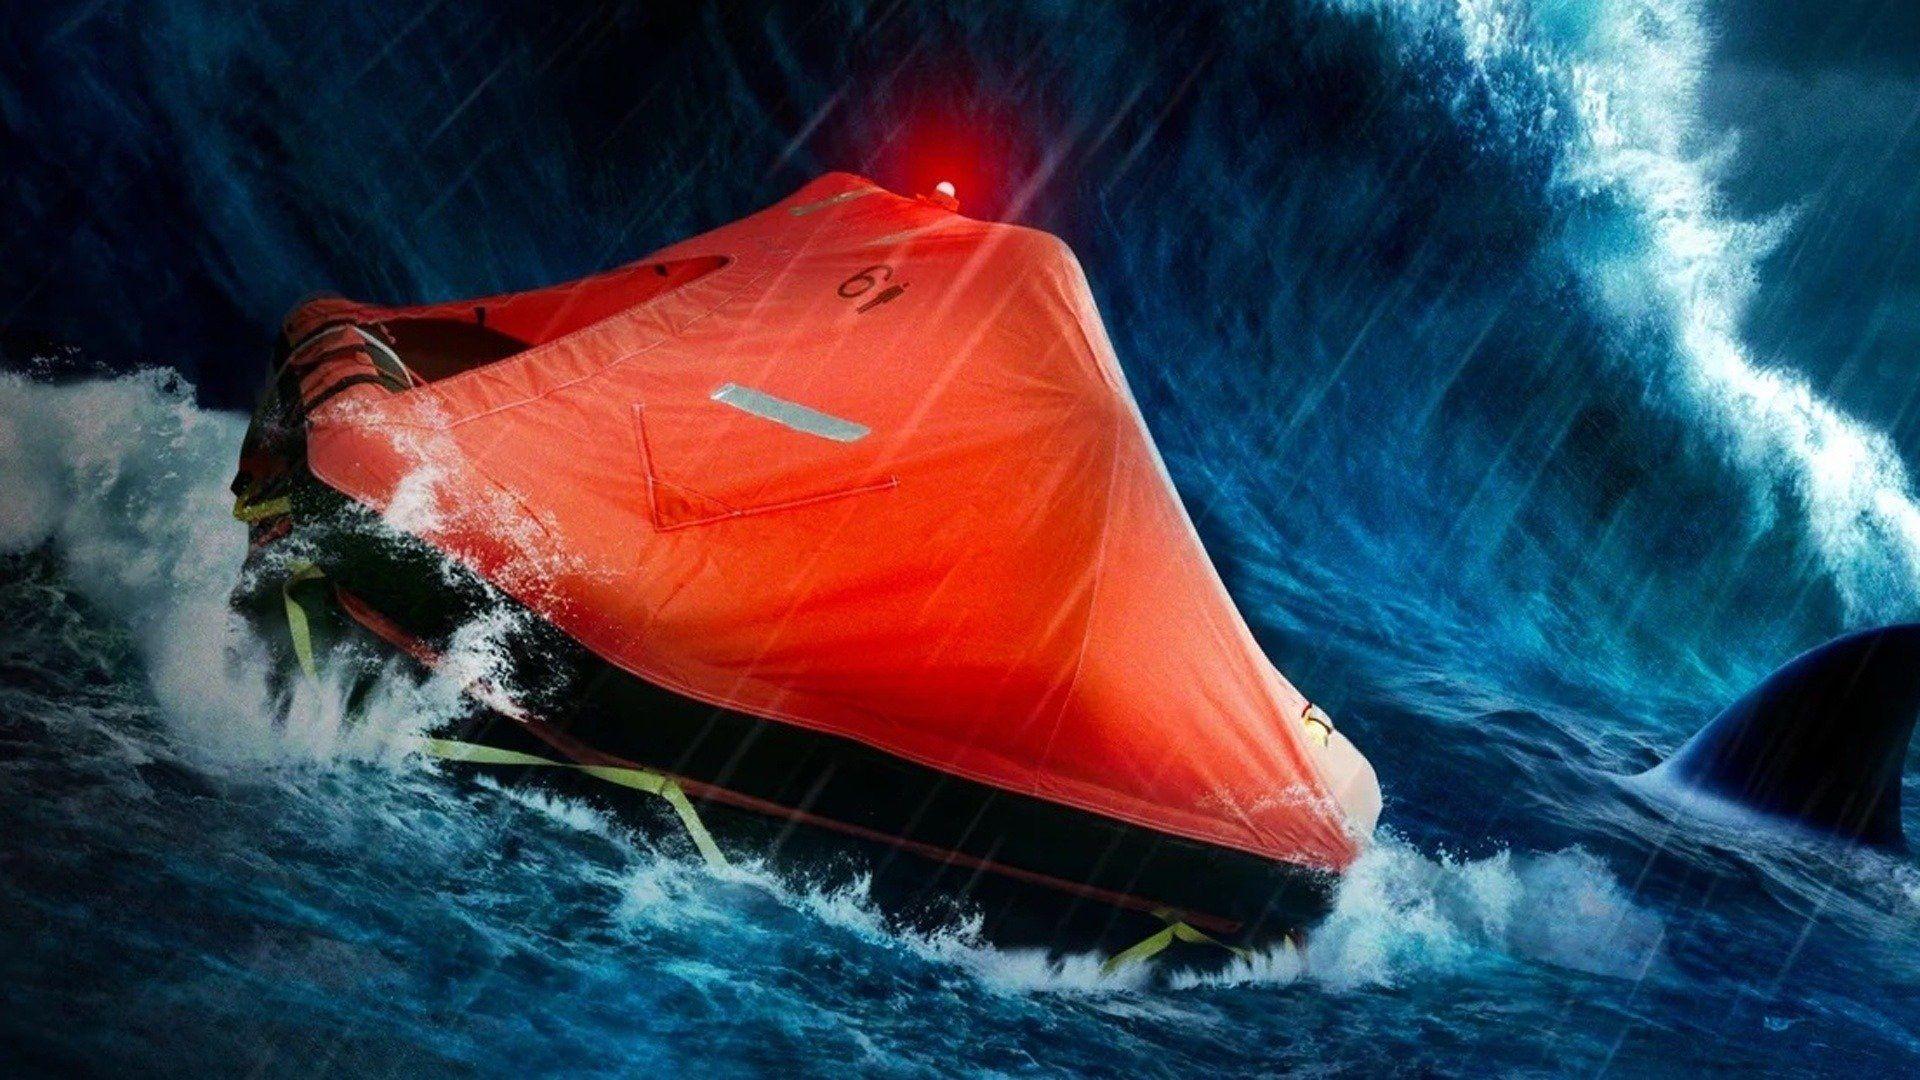 Season 01, Episode 01 Shark Survivor